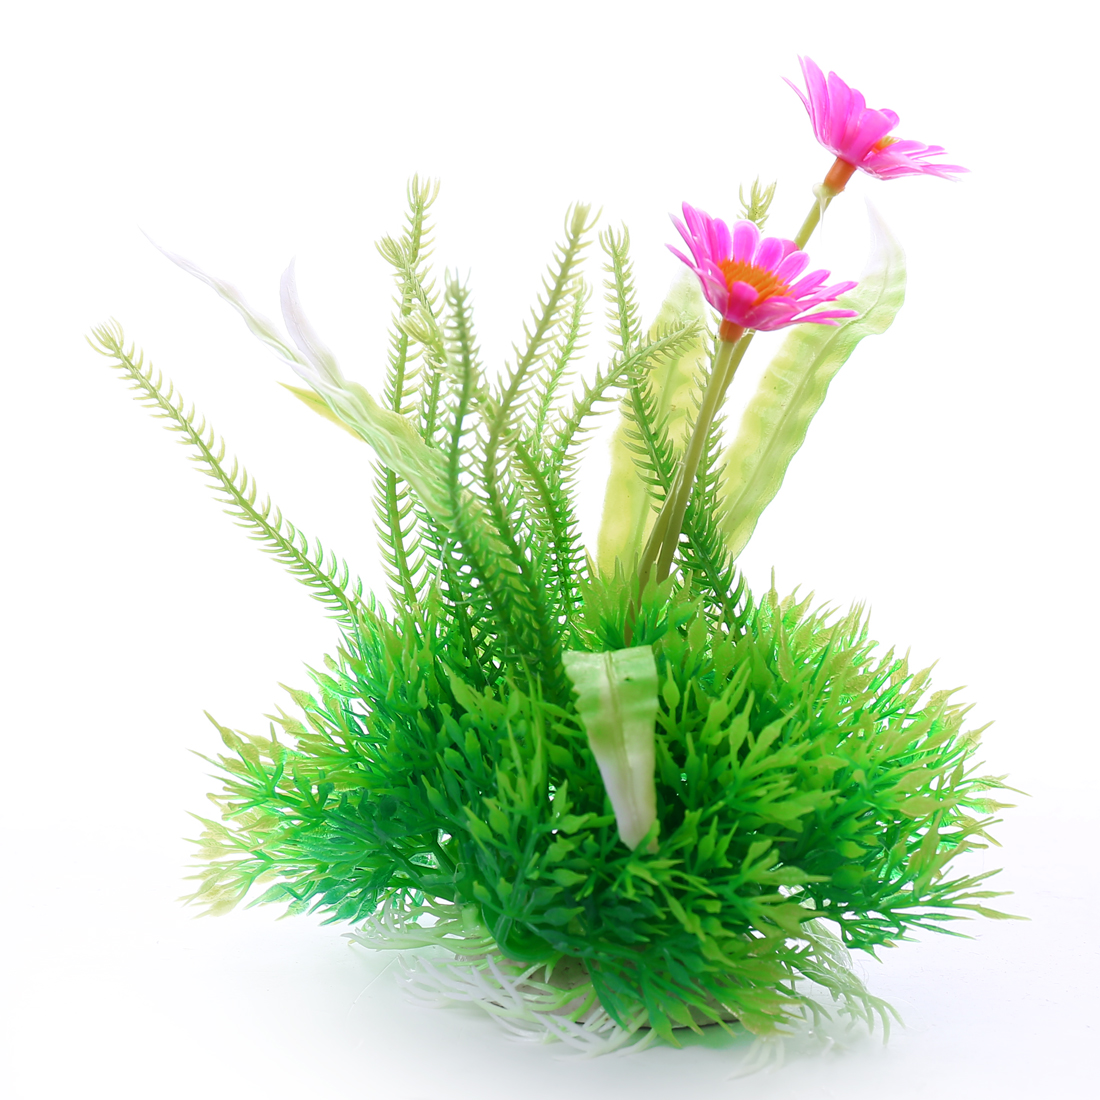 Max long 14cm Grass Leaf Flower Aquarium Plastic Plants Fish Tank Ornament